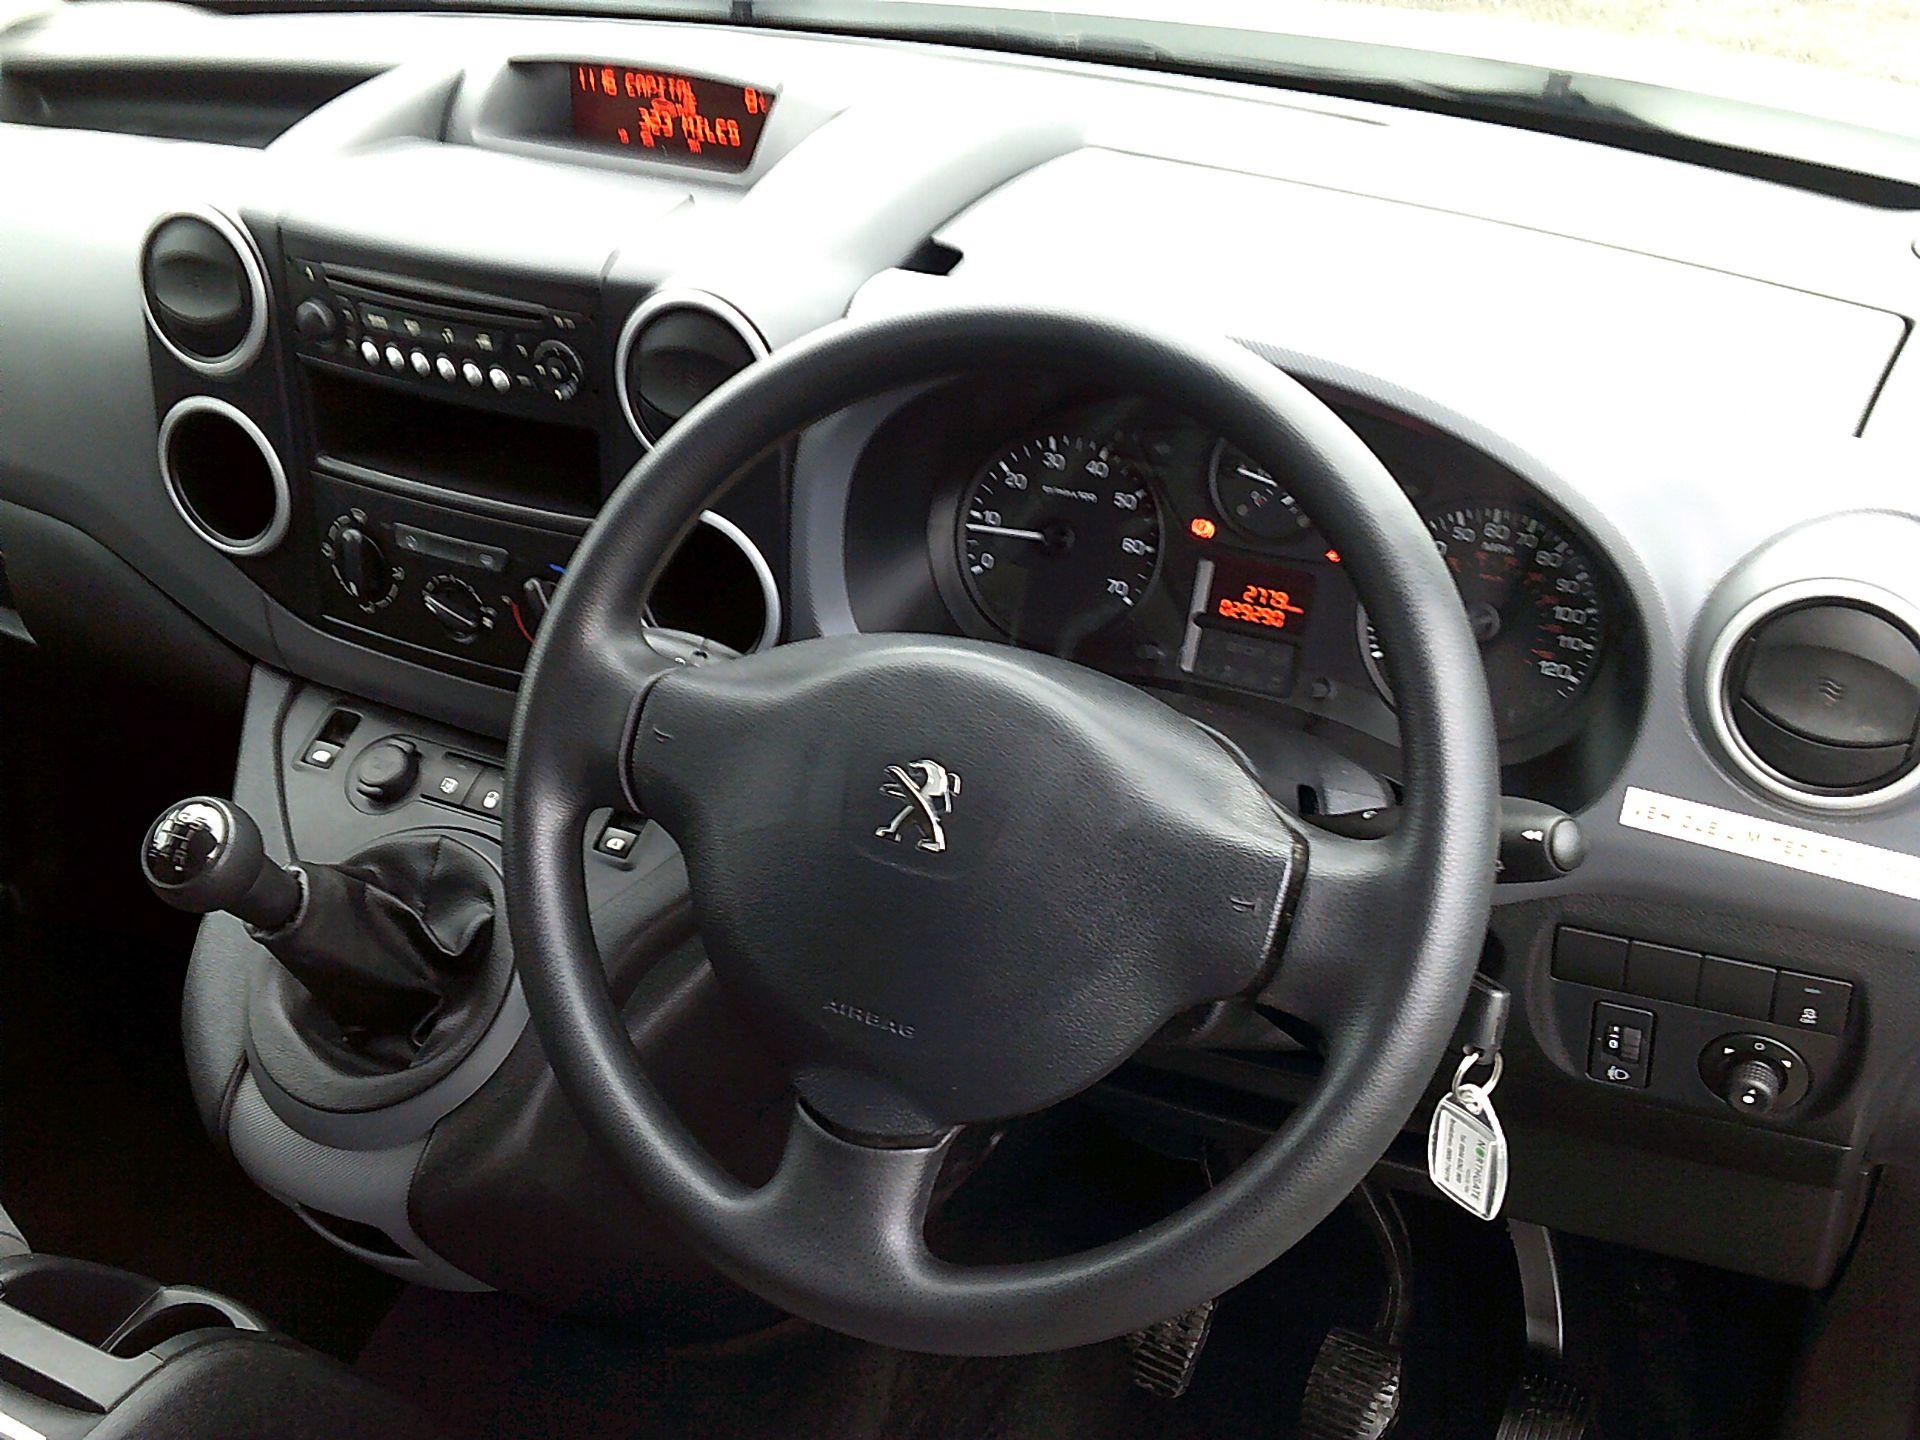 2016 Peugeot Partner L2 715 S 1.6 BLUEHDI 100 CREW VAN EURO 6 *SPEED RESTRICTED TO 56MPH* (NU66WKZ) Image 17